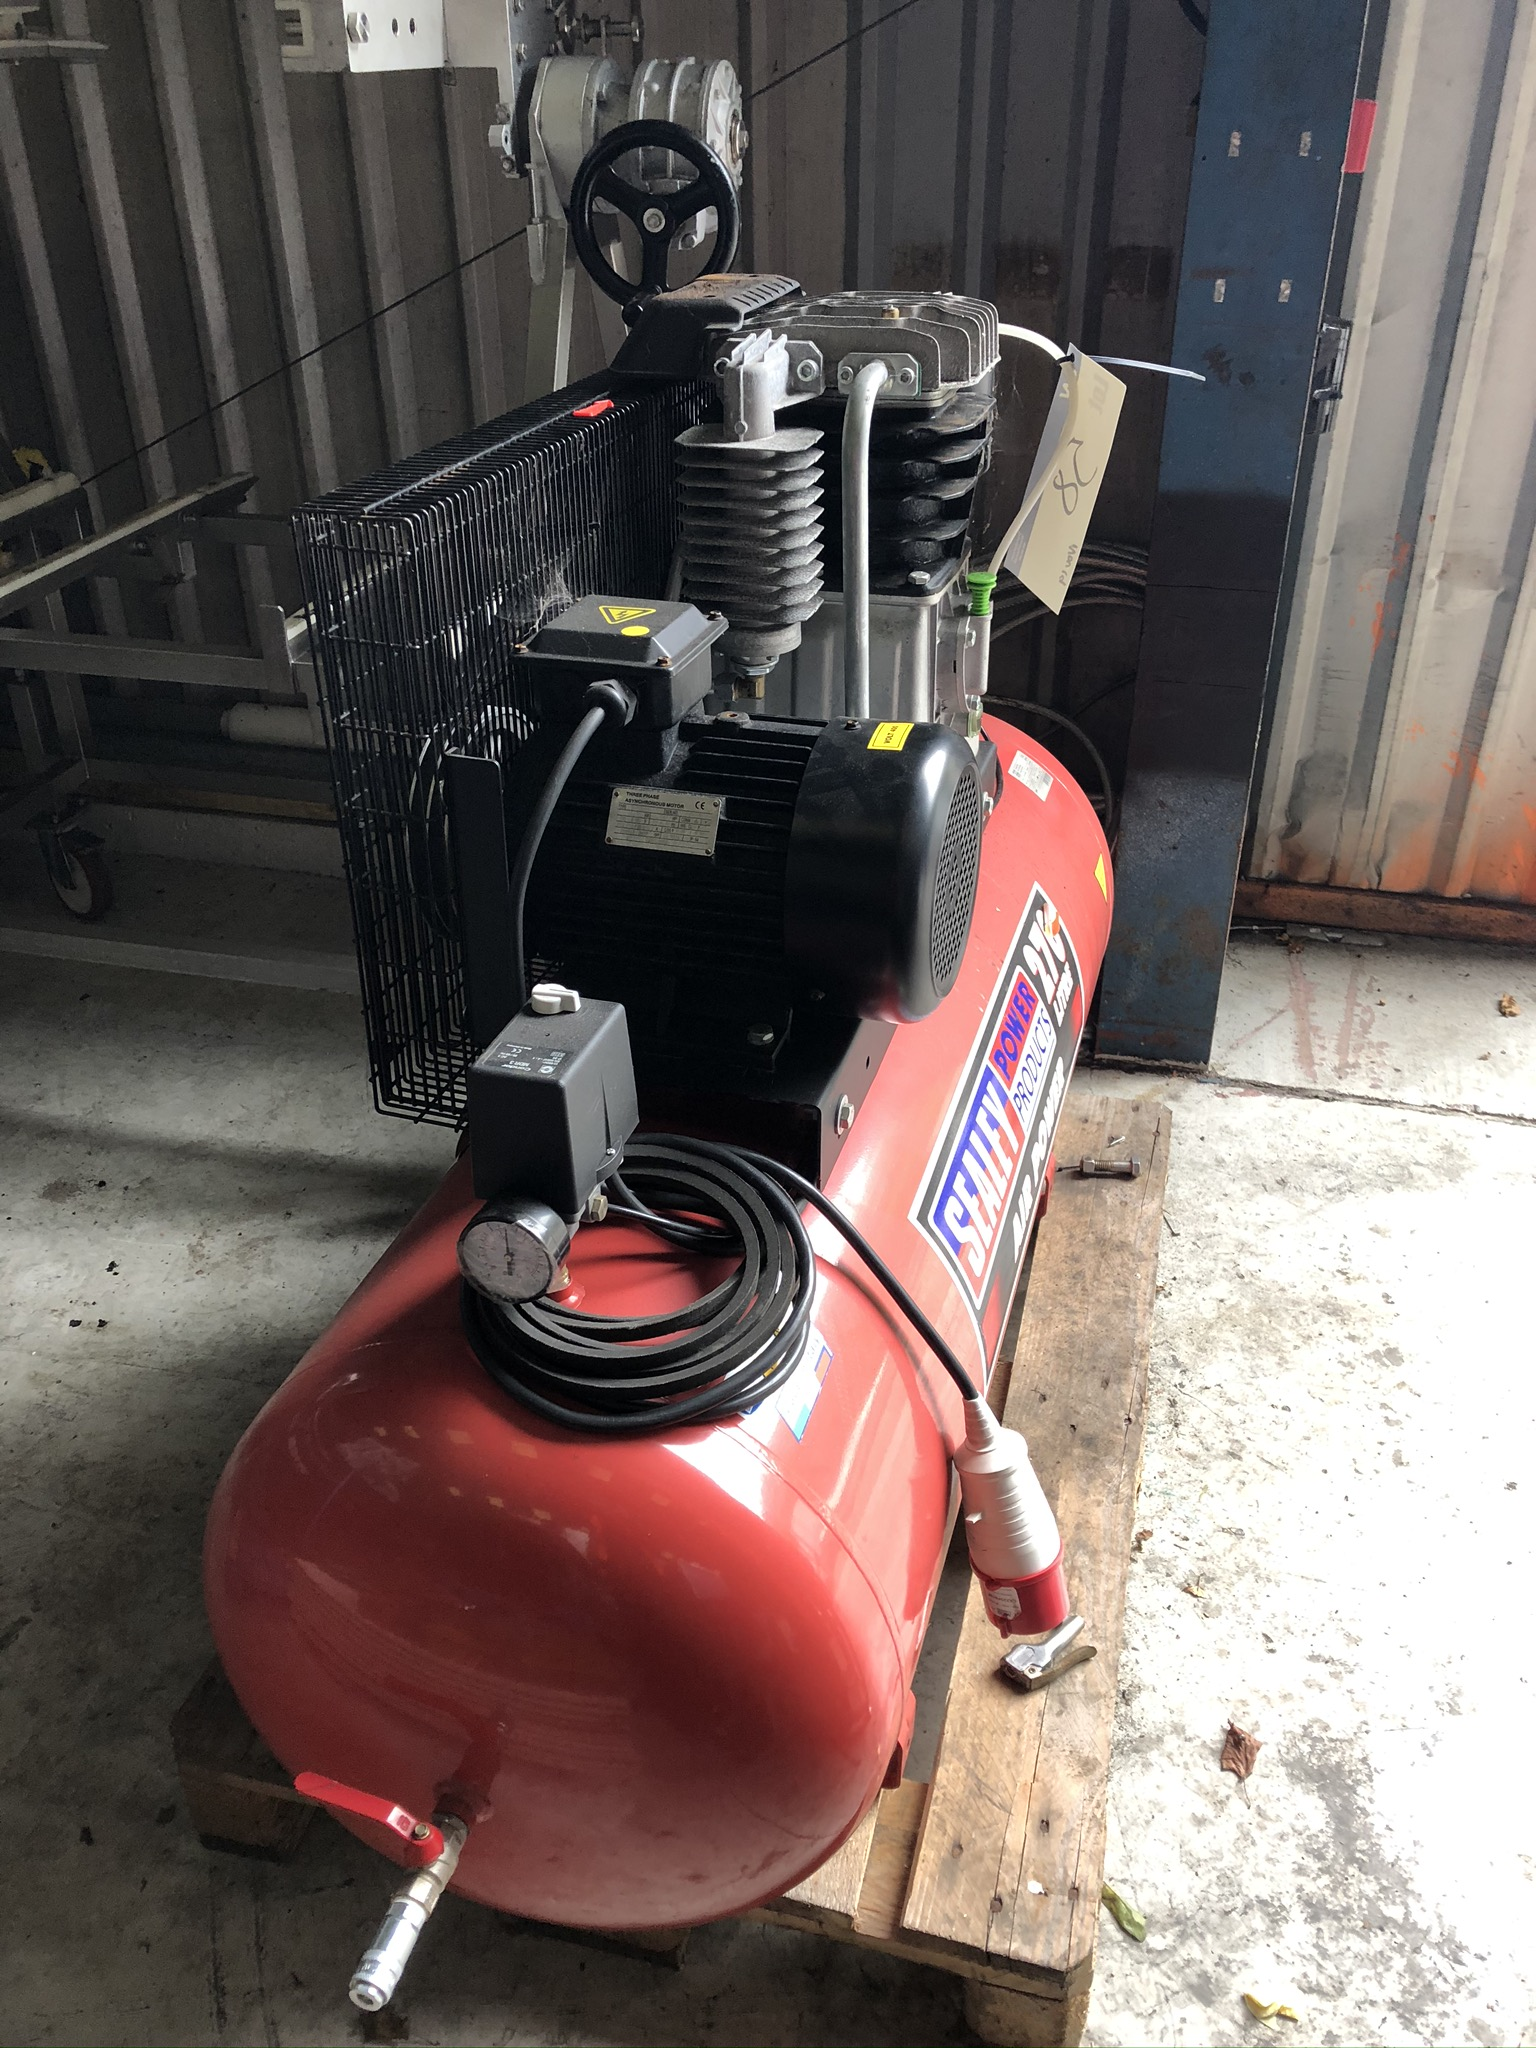 Lot 58 - Sealey Receiver Mounted Air Compressor, plant no.